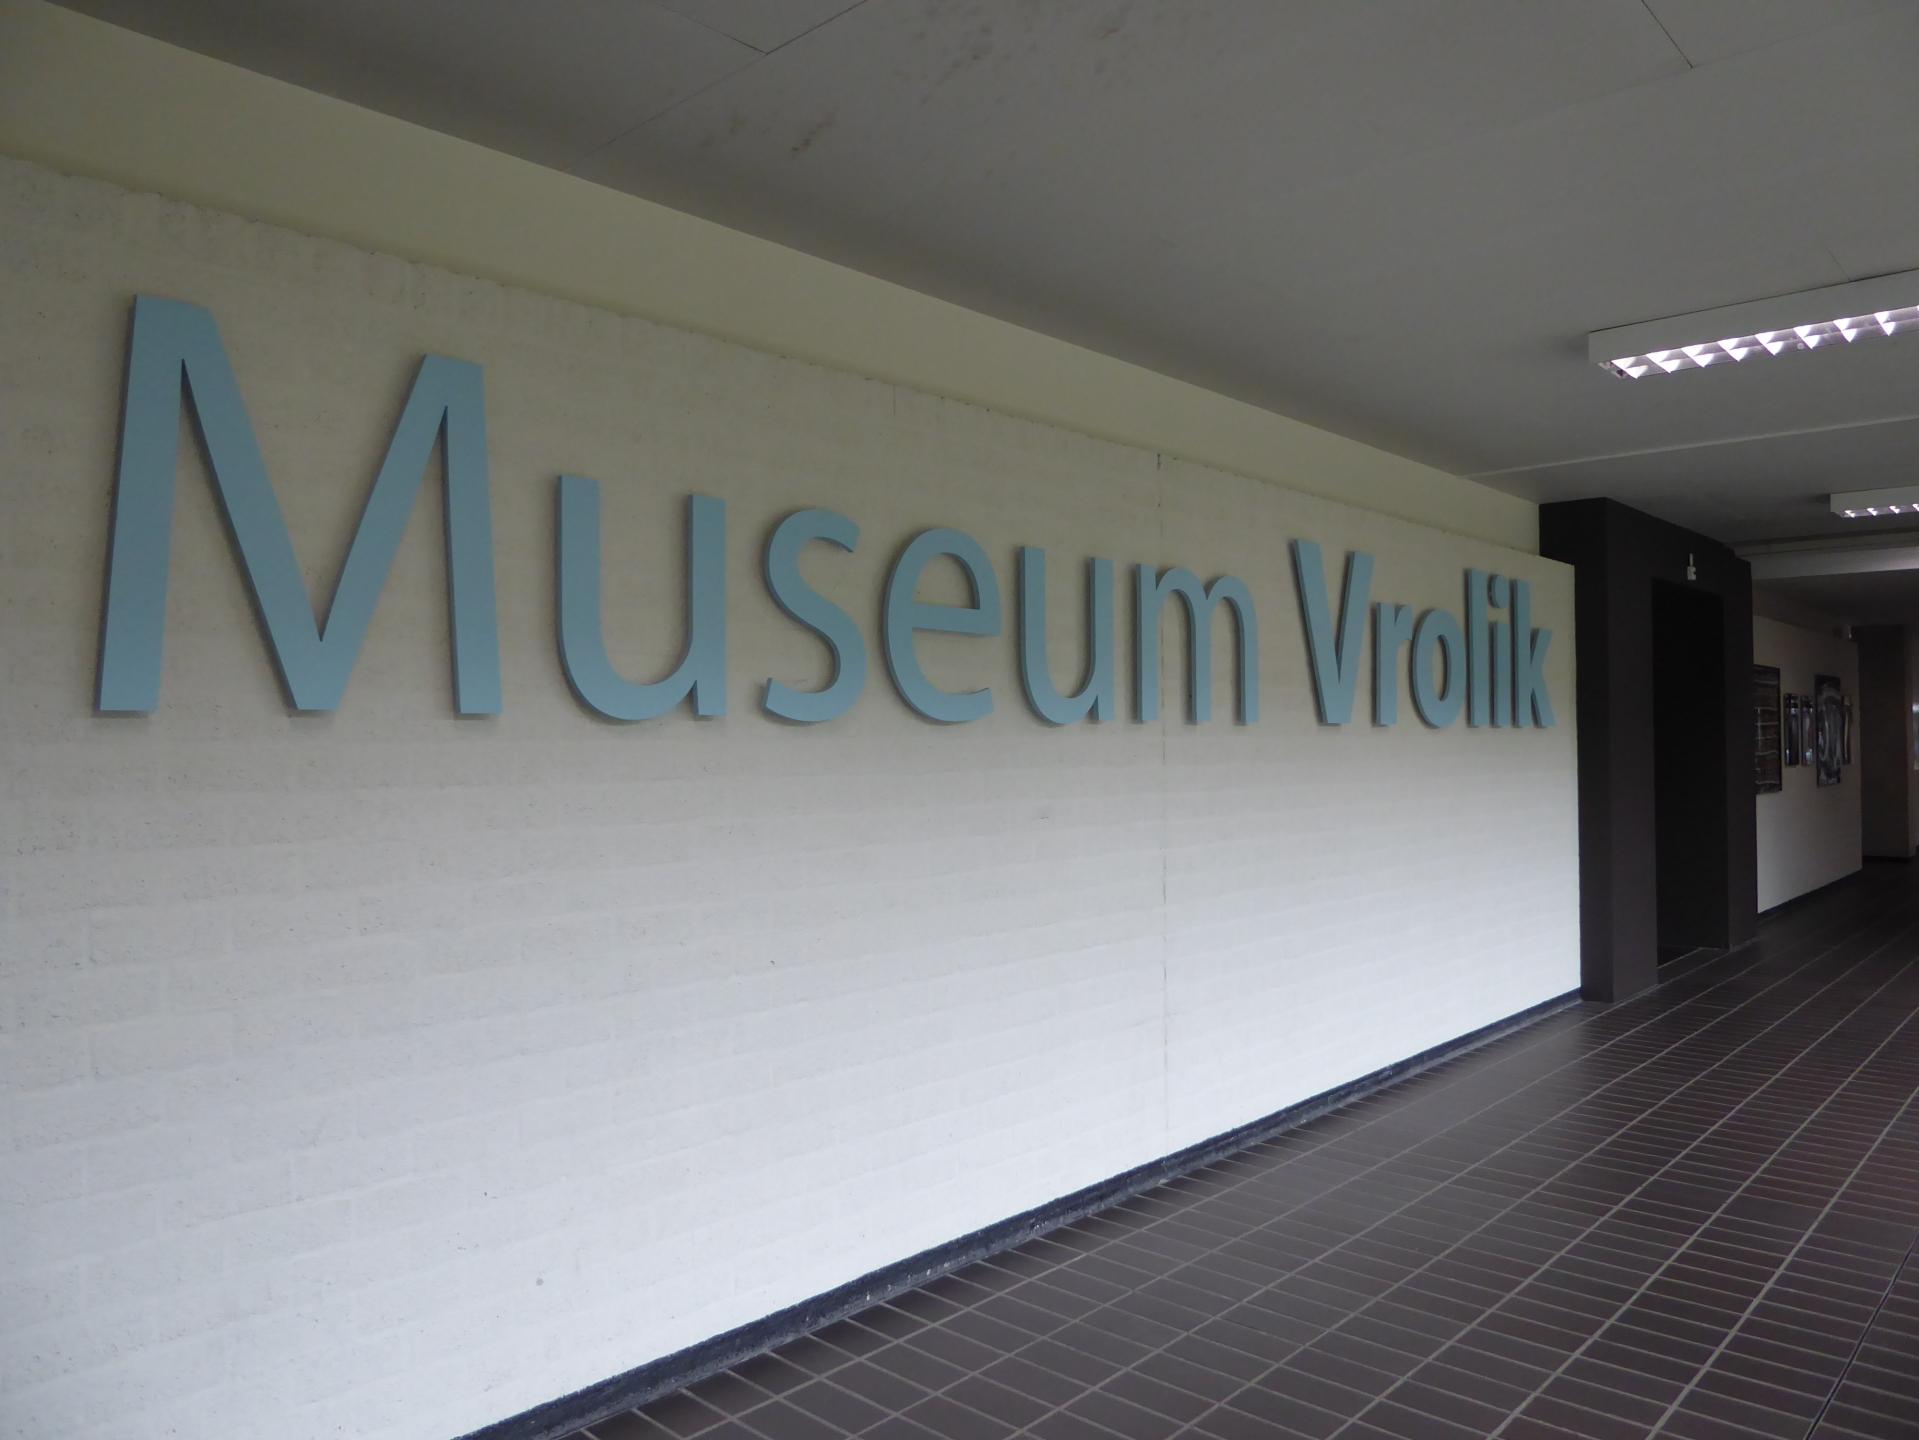 museum vrolik entrance museums amsterdam unusual anatomy pathology mutations collection